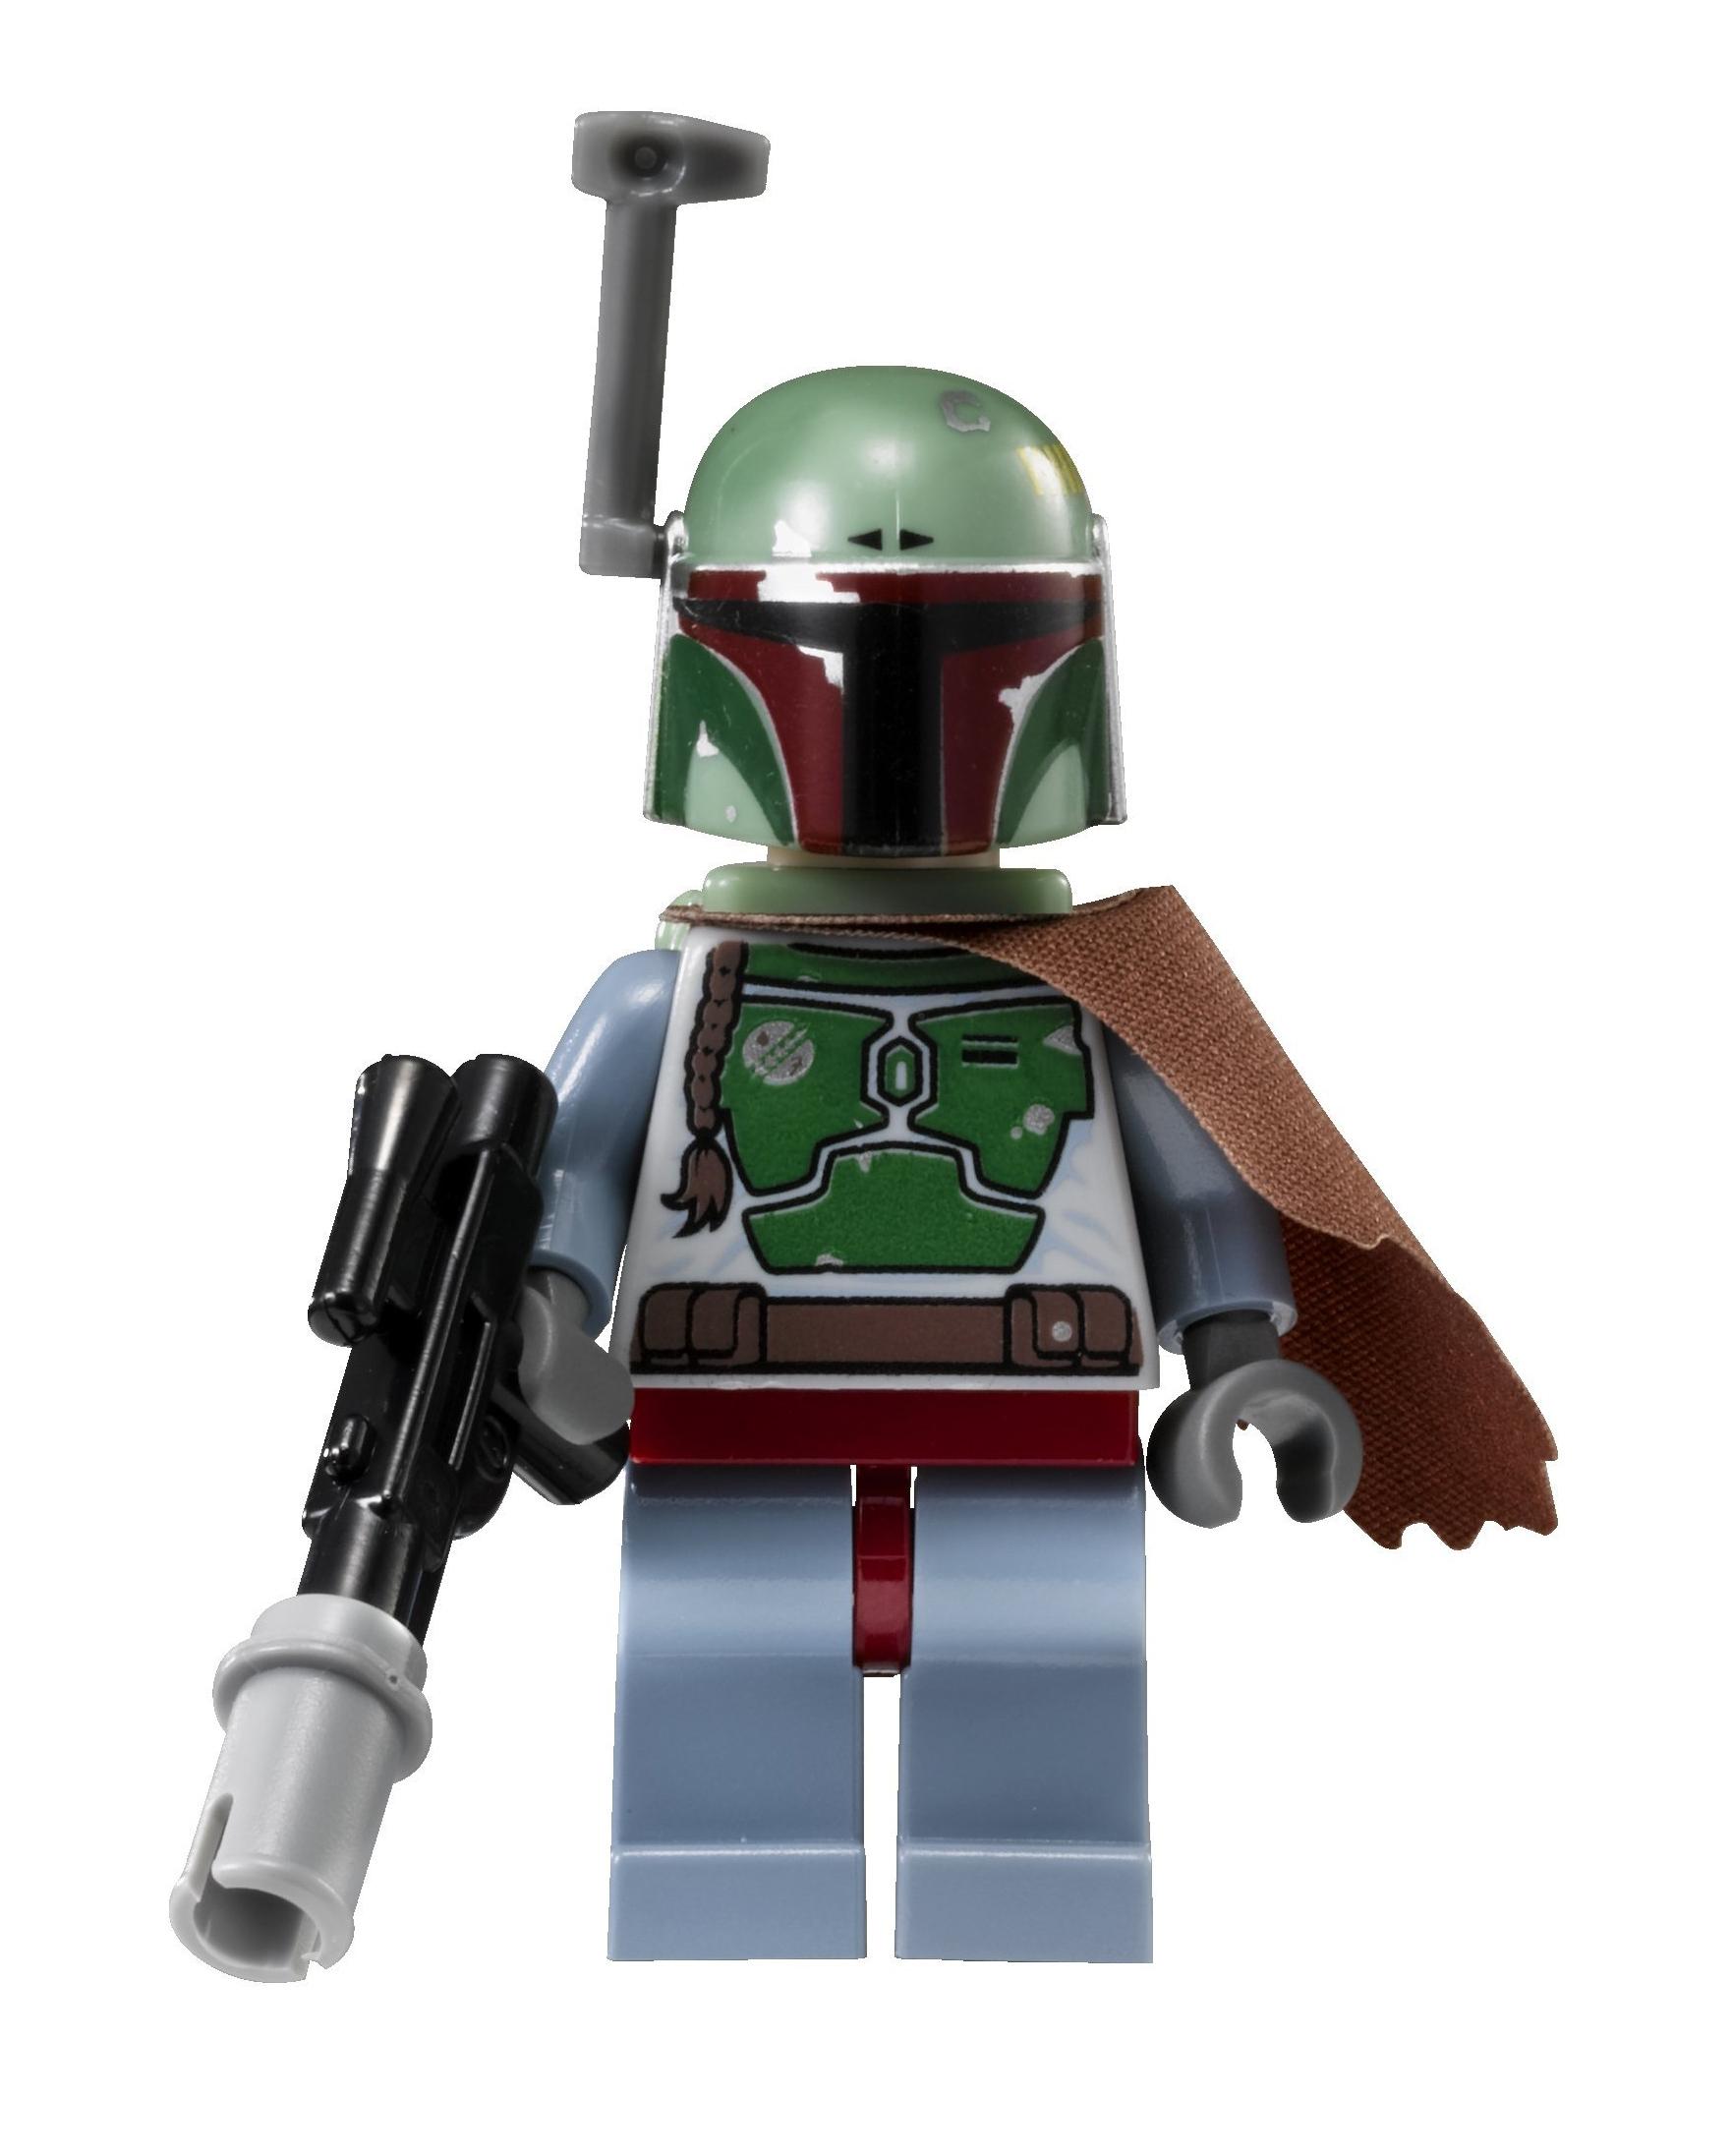 Lego Boba Fett 6210 6209 Bluish Grays Star Wars Minifigure